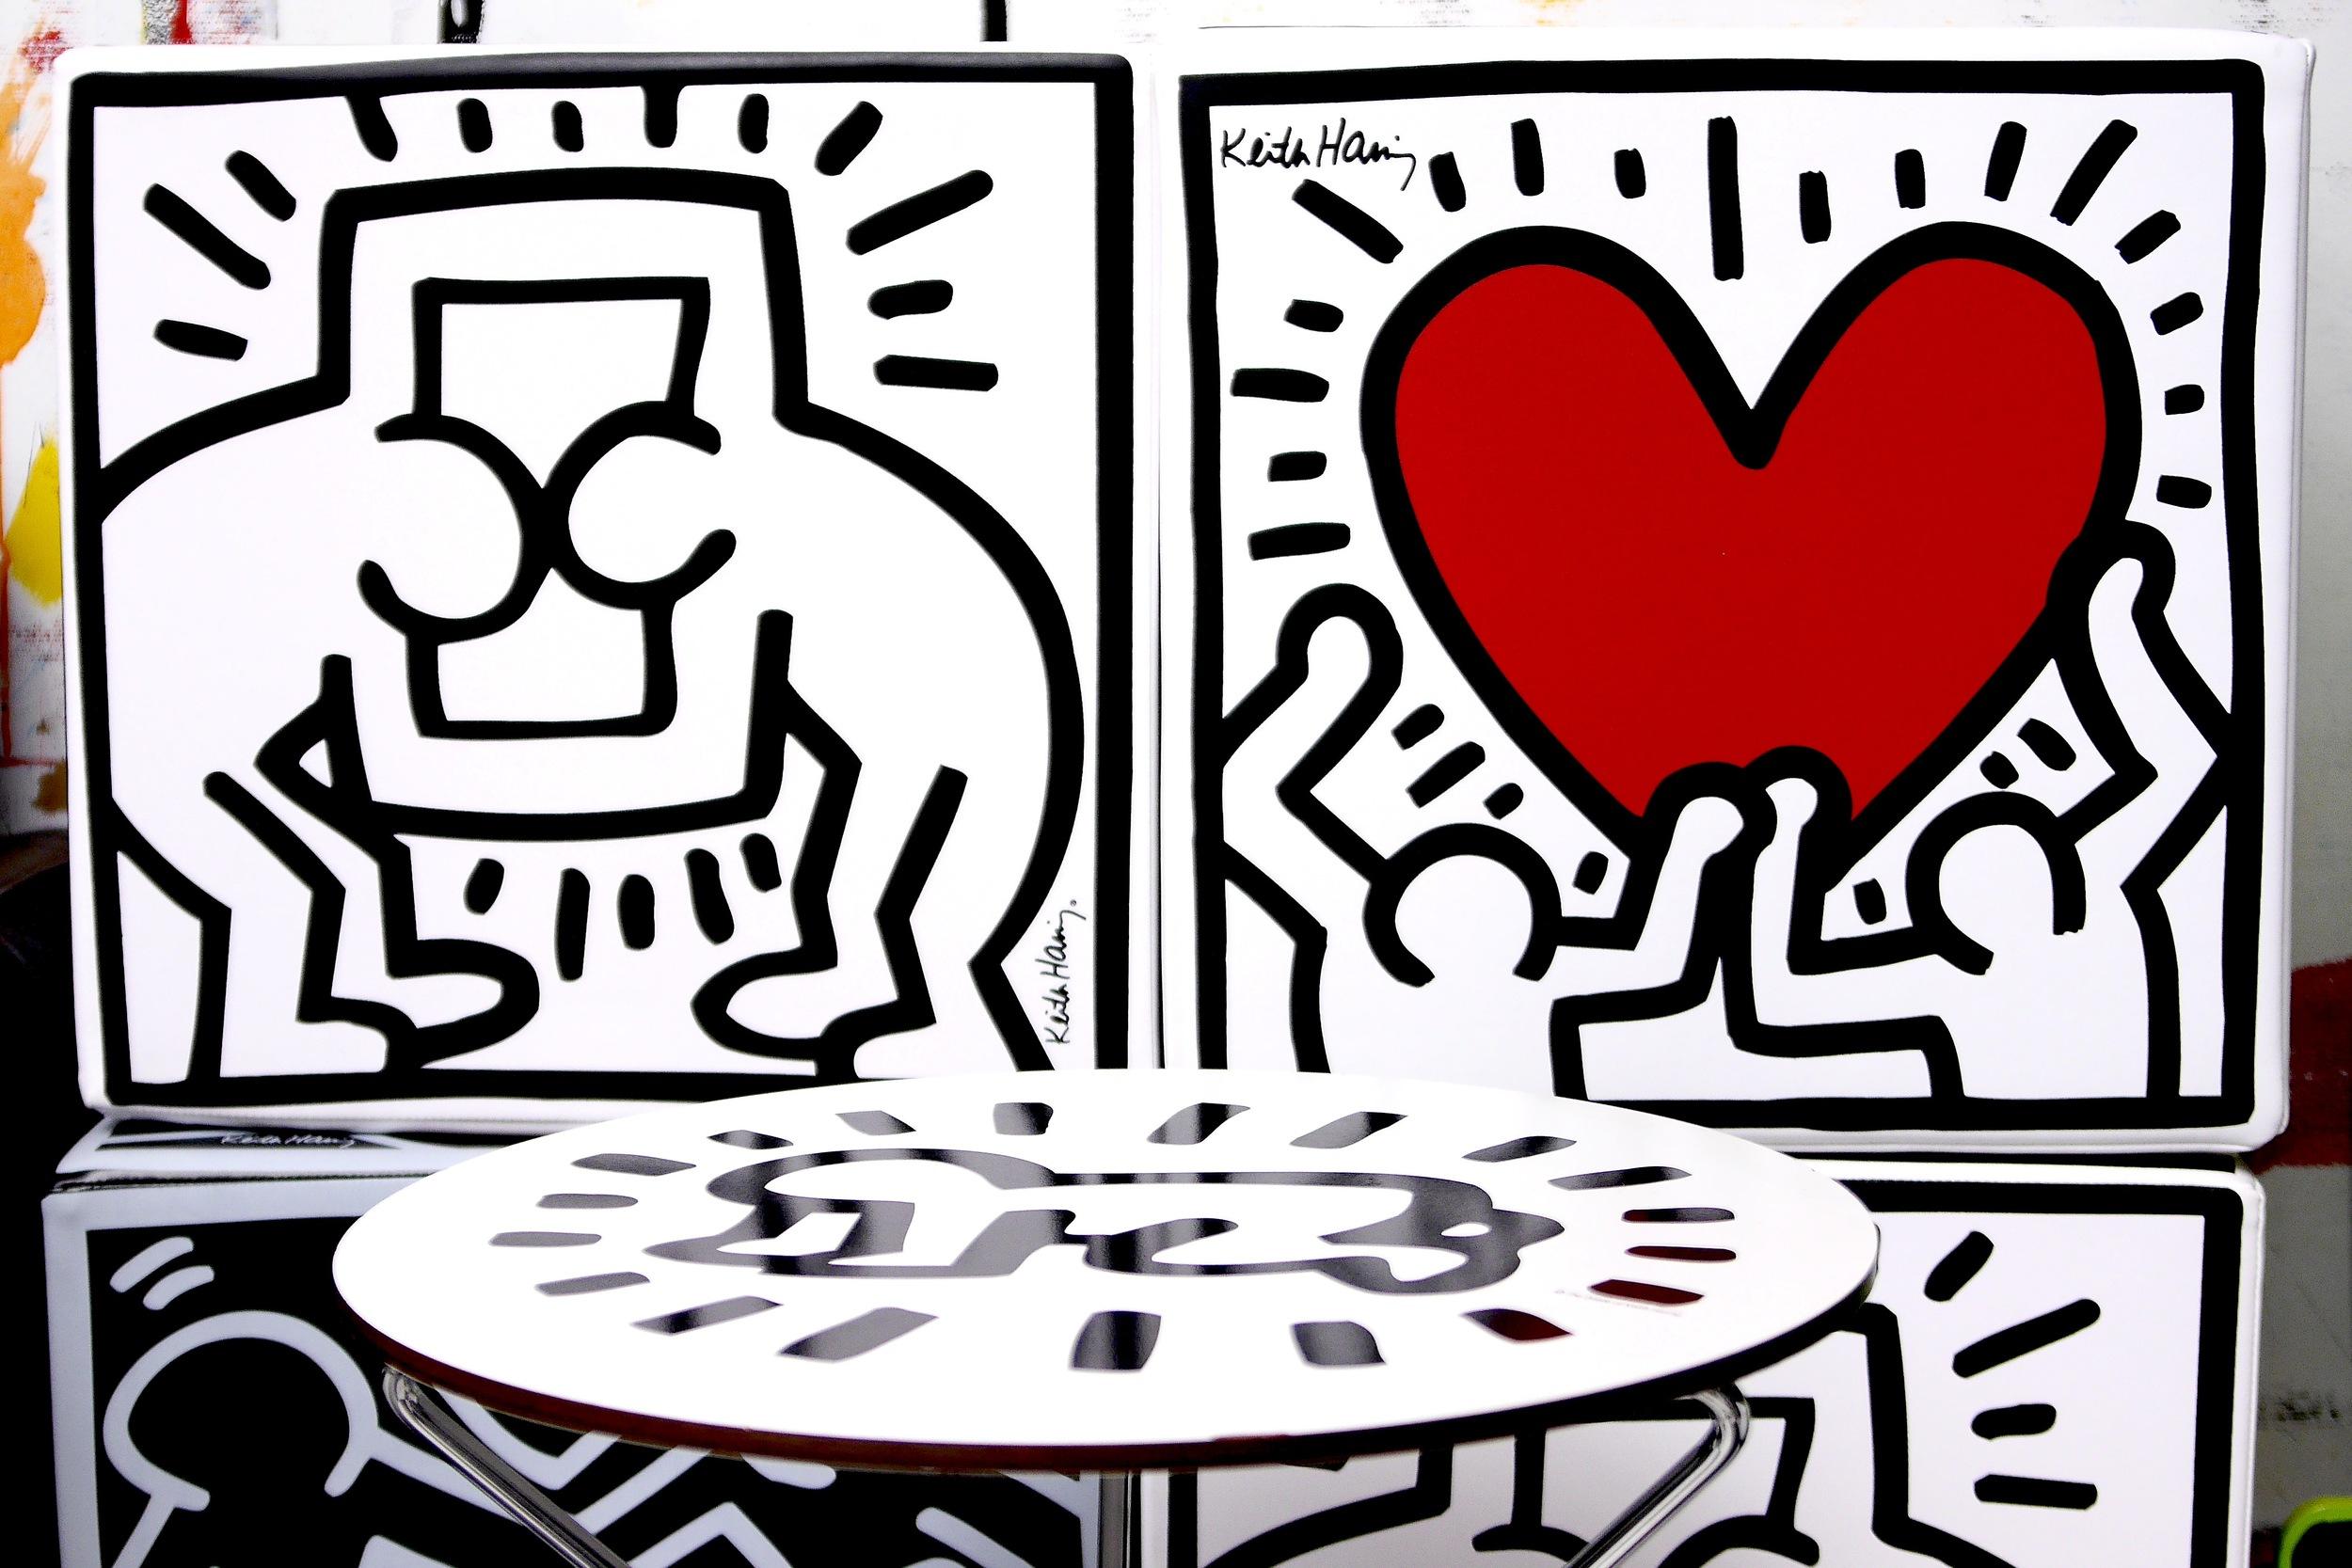 Maria-Brito_Keith-Haring-Foundation-2.jpg